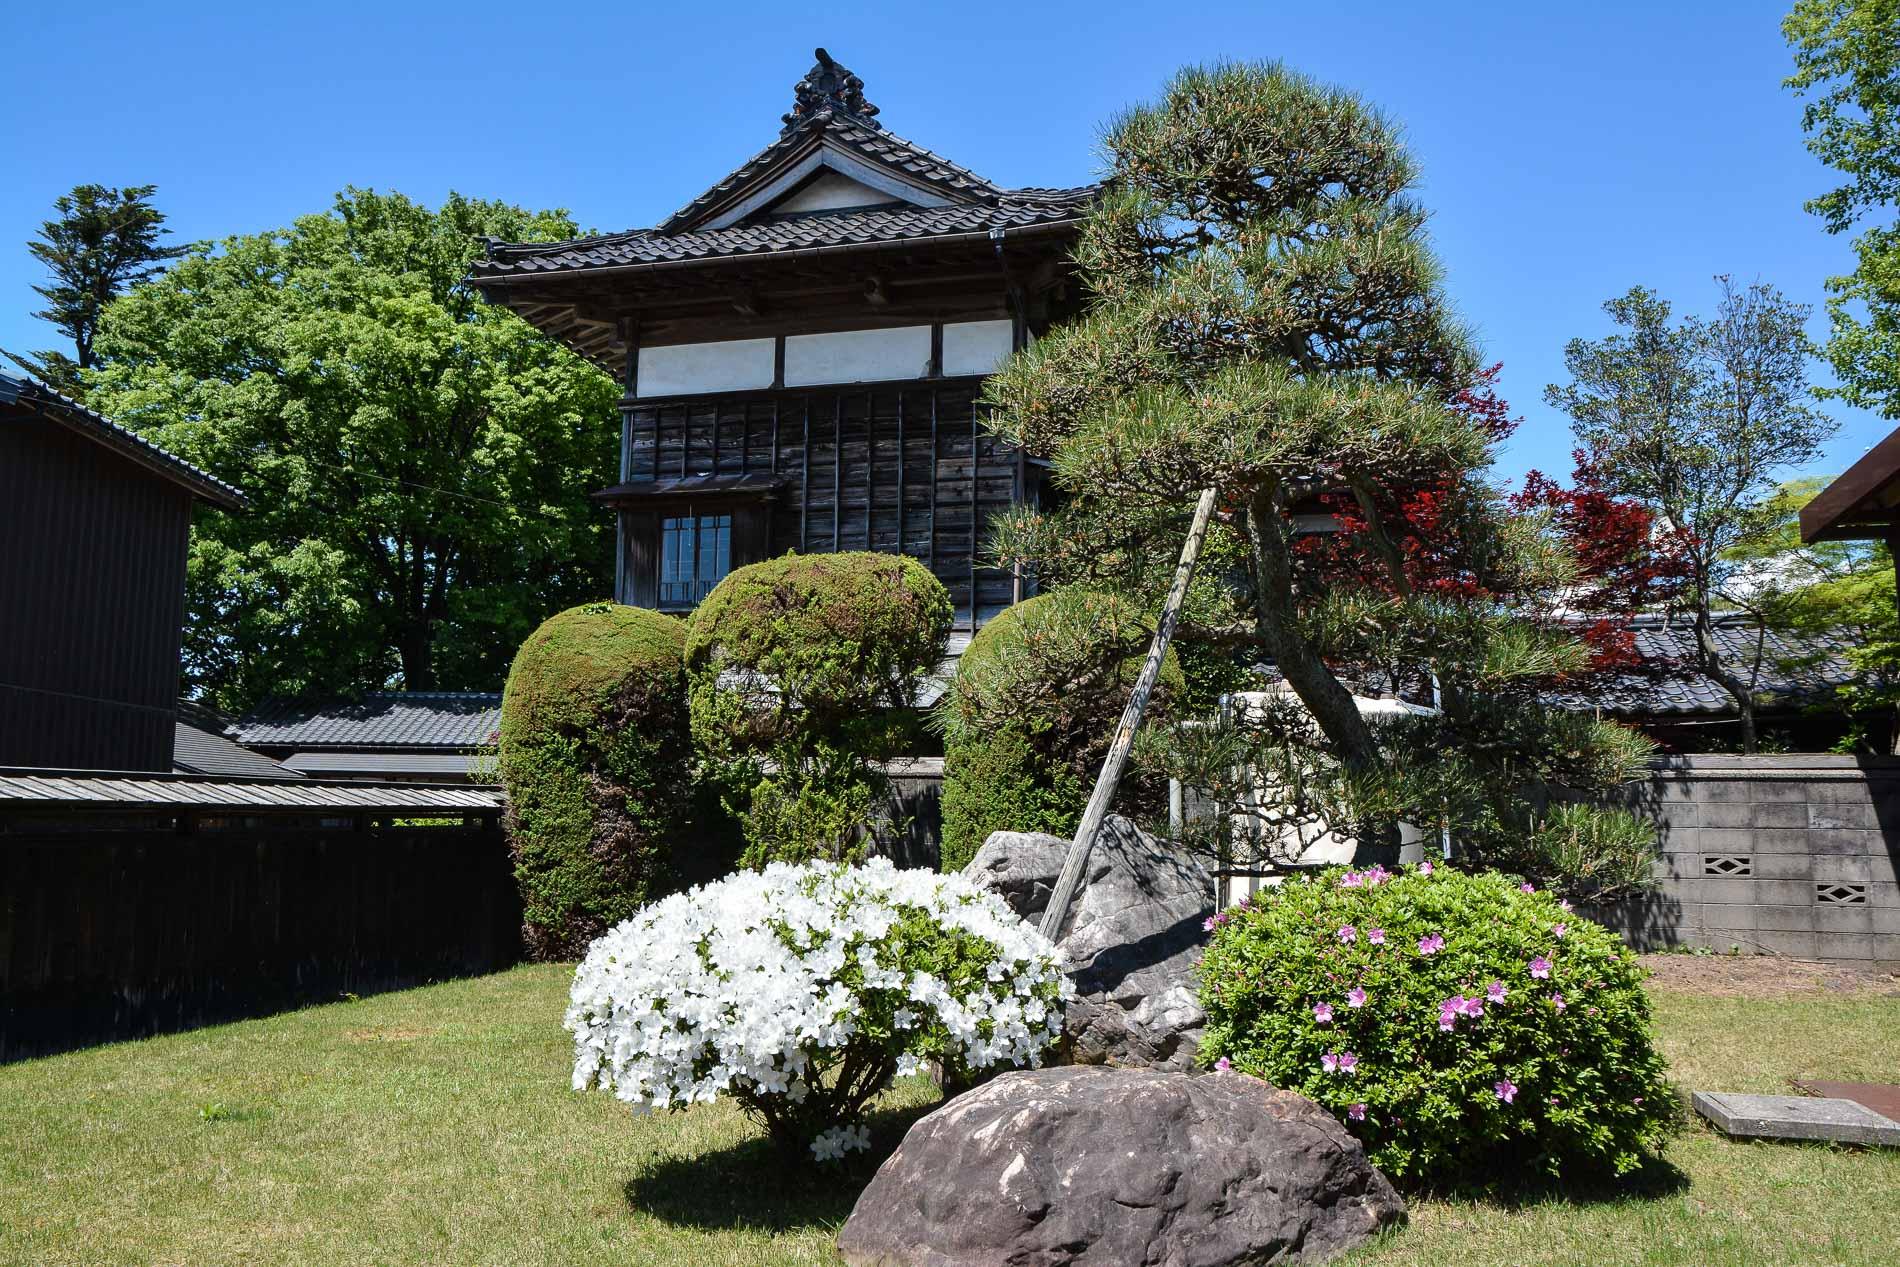 Murakami descubre sus maravillosos jardines japoneses - Jardines de japon ...